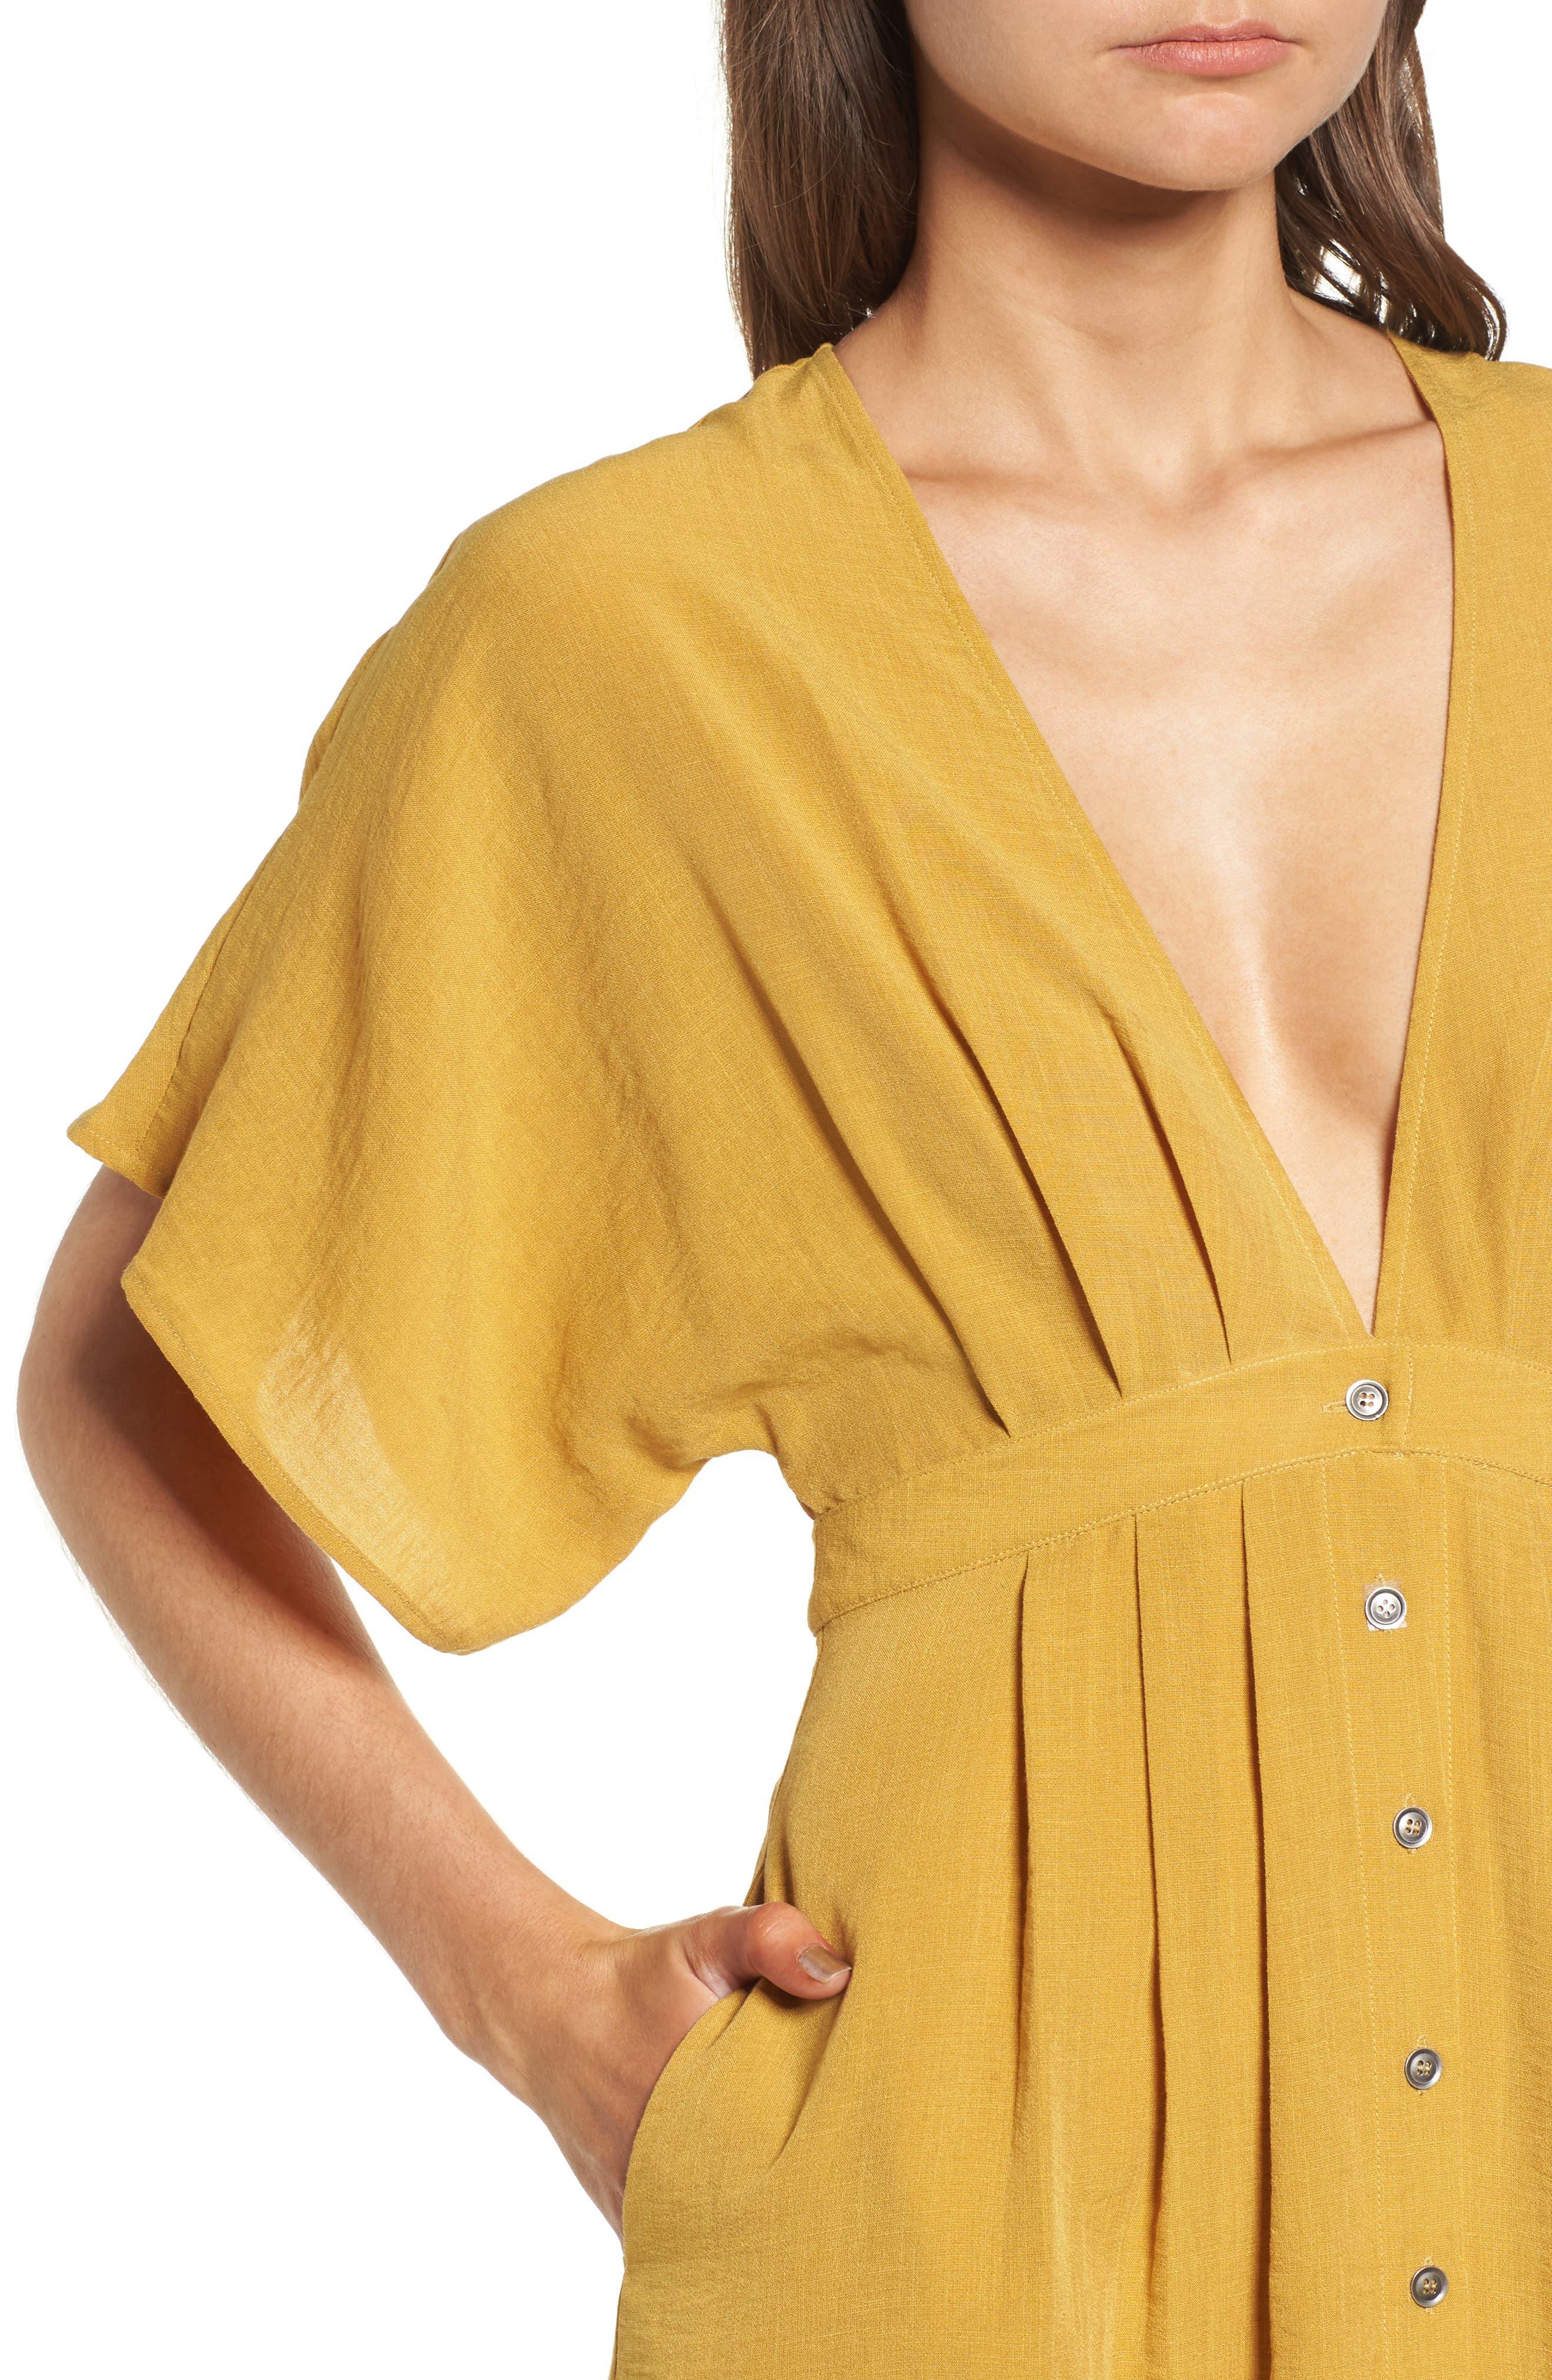 Poppy Button Front Midi Dress,                             Alternate thumbnail 5, color,                             Mustard